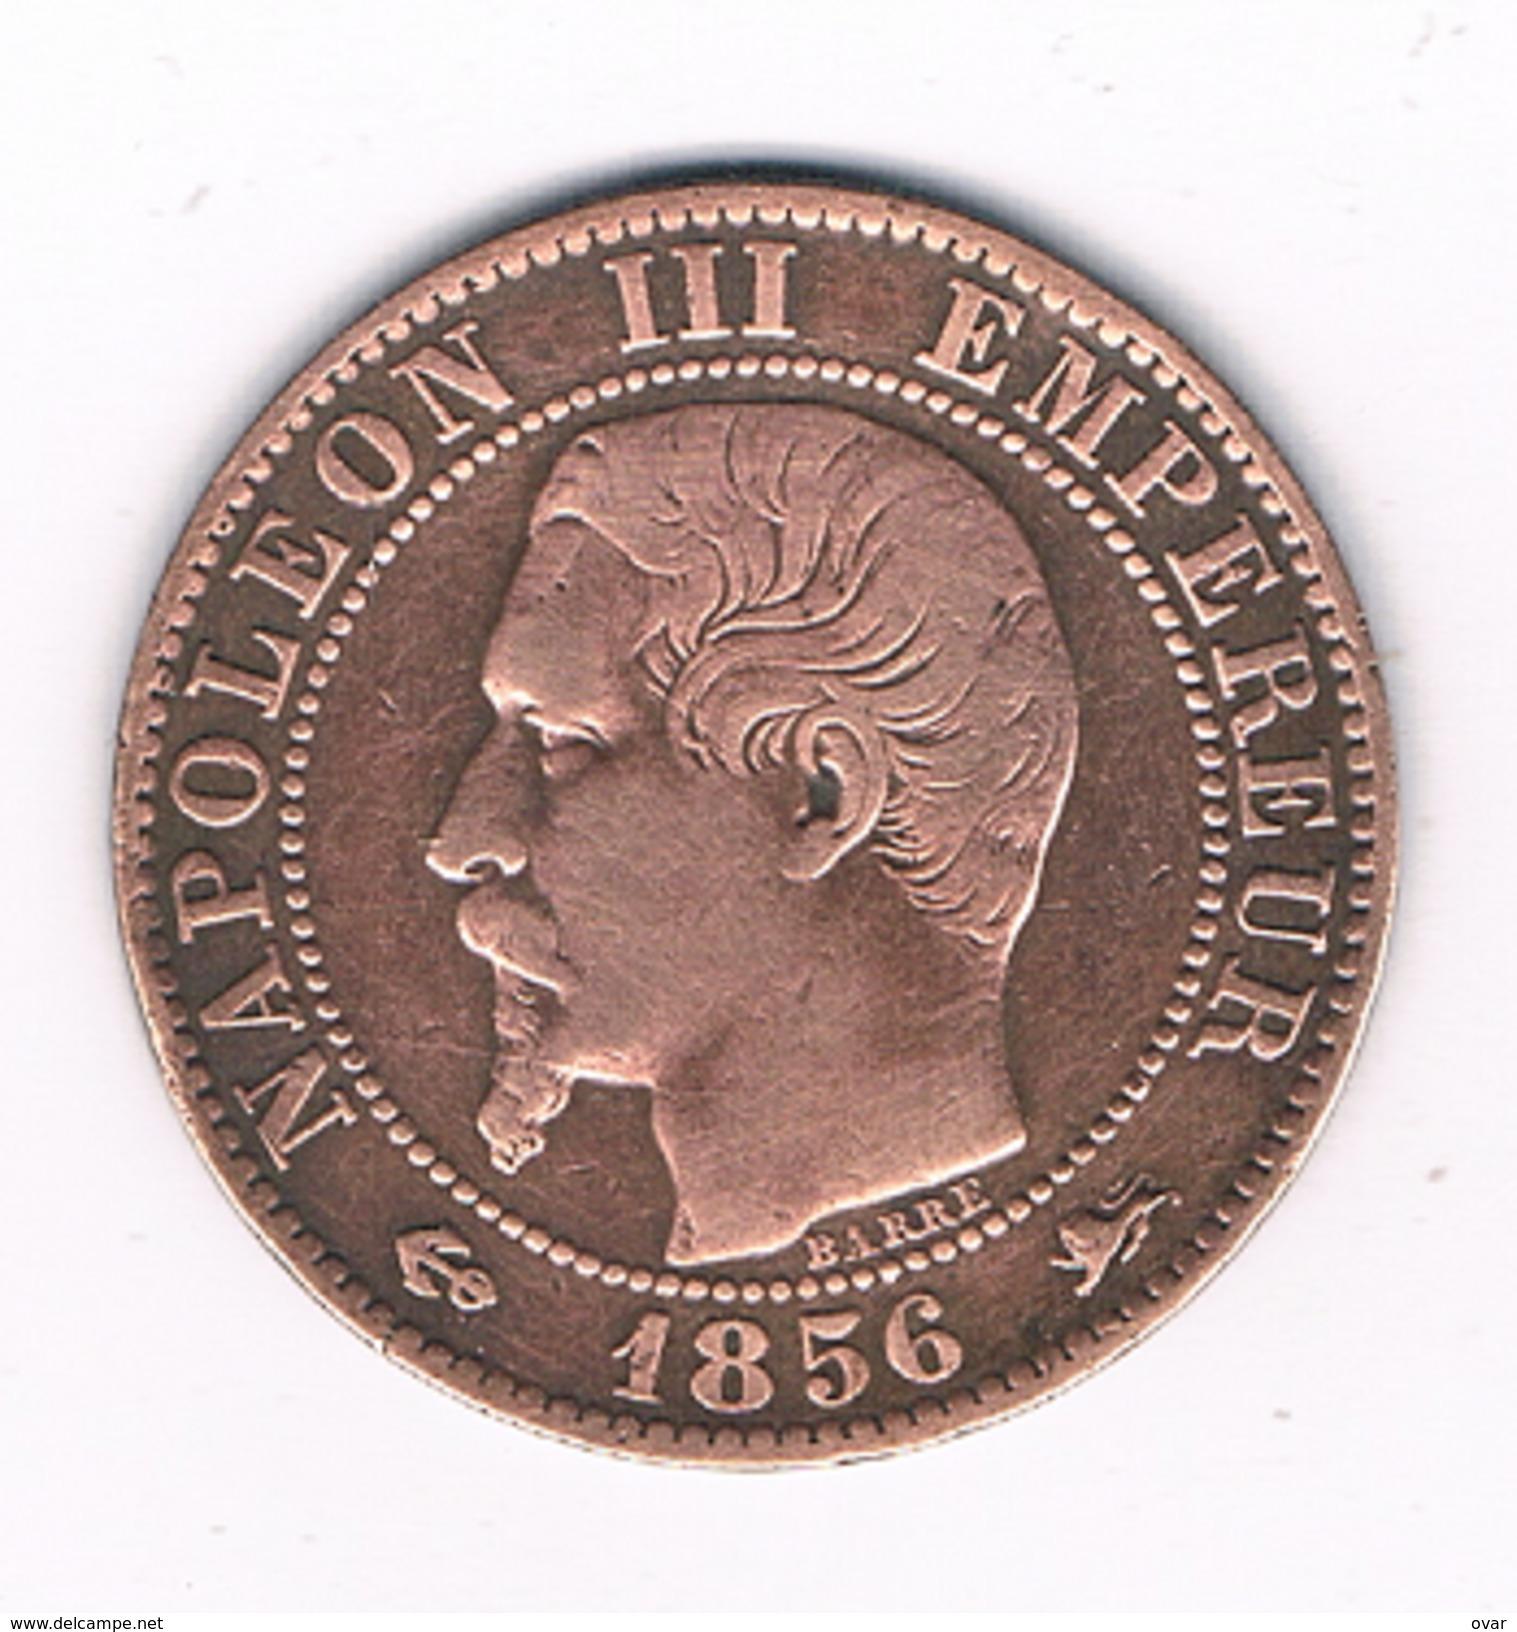 5 CENTIMES 1856 D FRANKRIJK /1527C/ - France